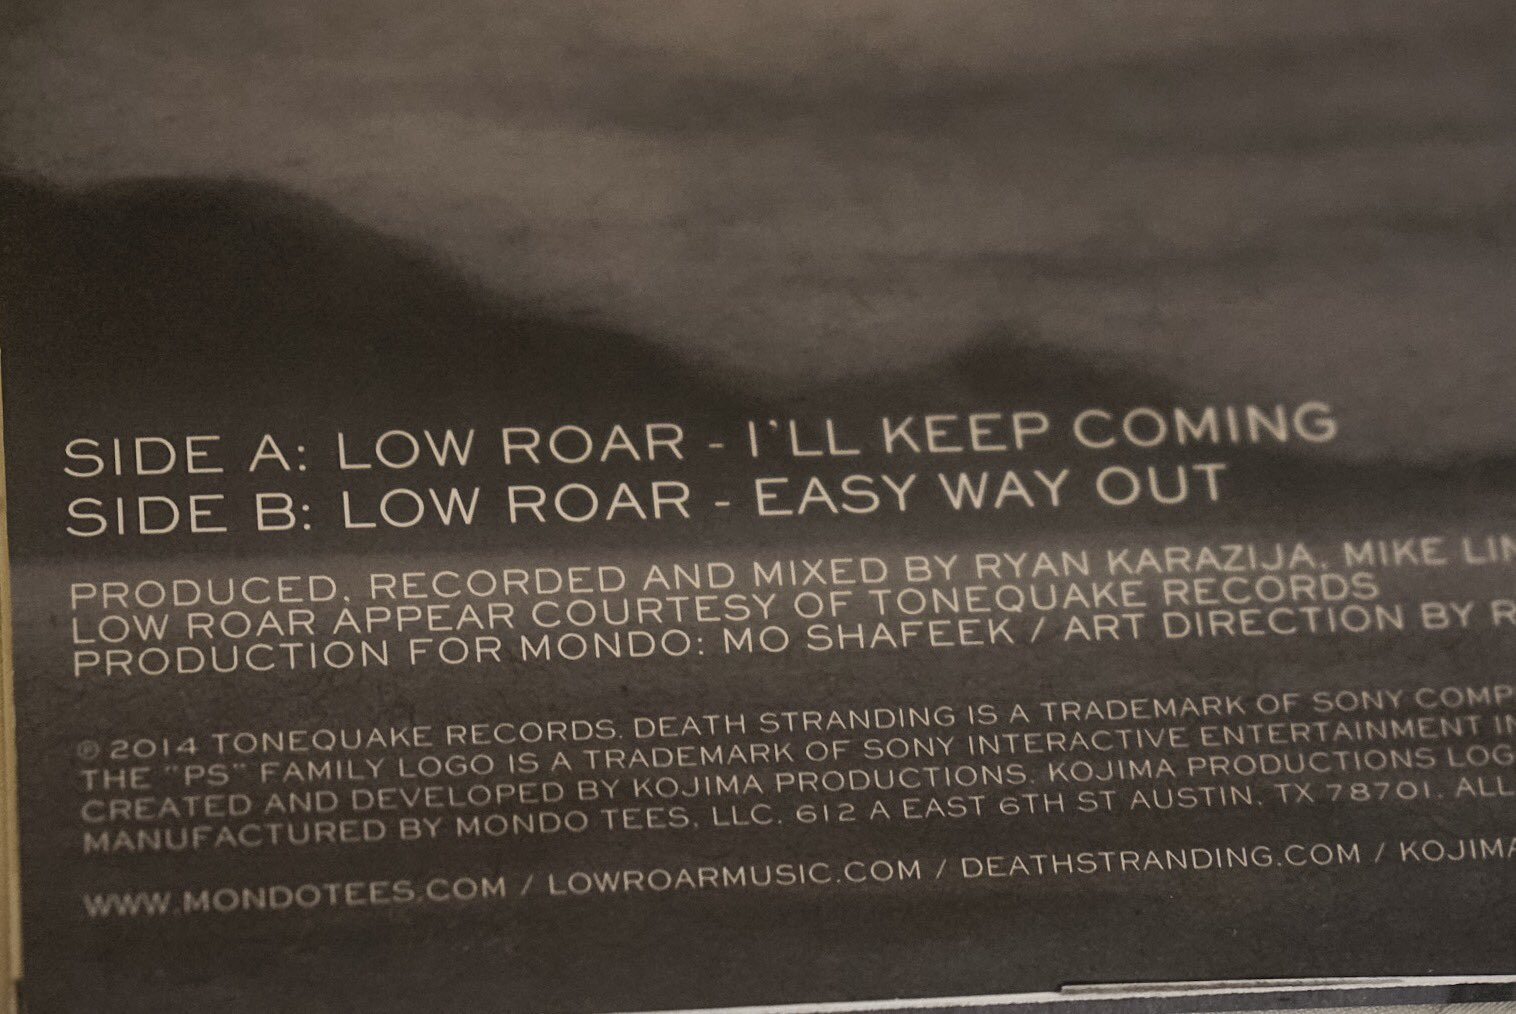 Vinyl limté de Death Stranding – Low Roar